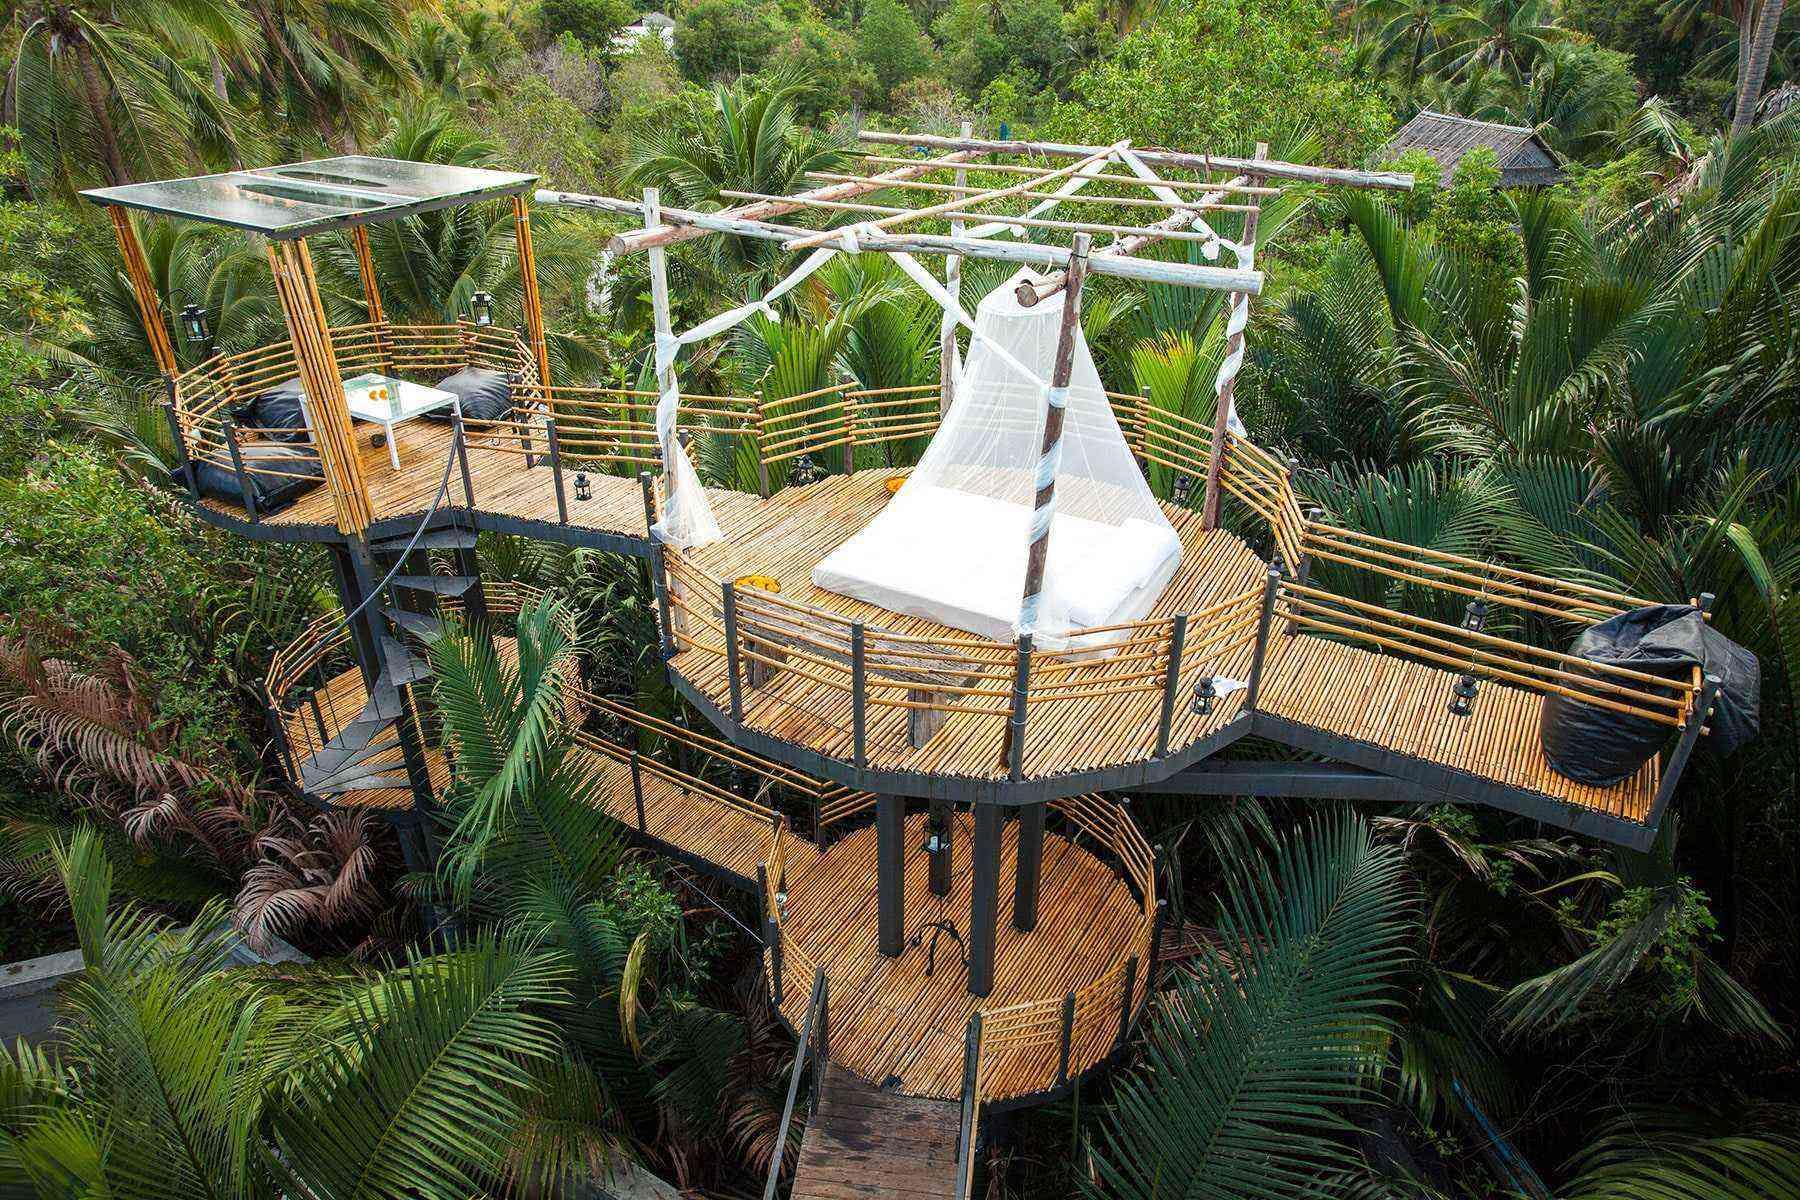 Unusual-Treehouses-Bangkok-Treehouse-1